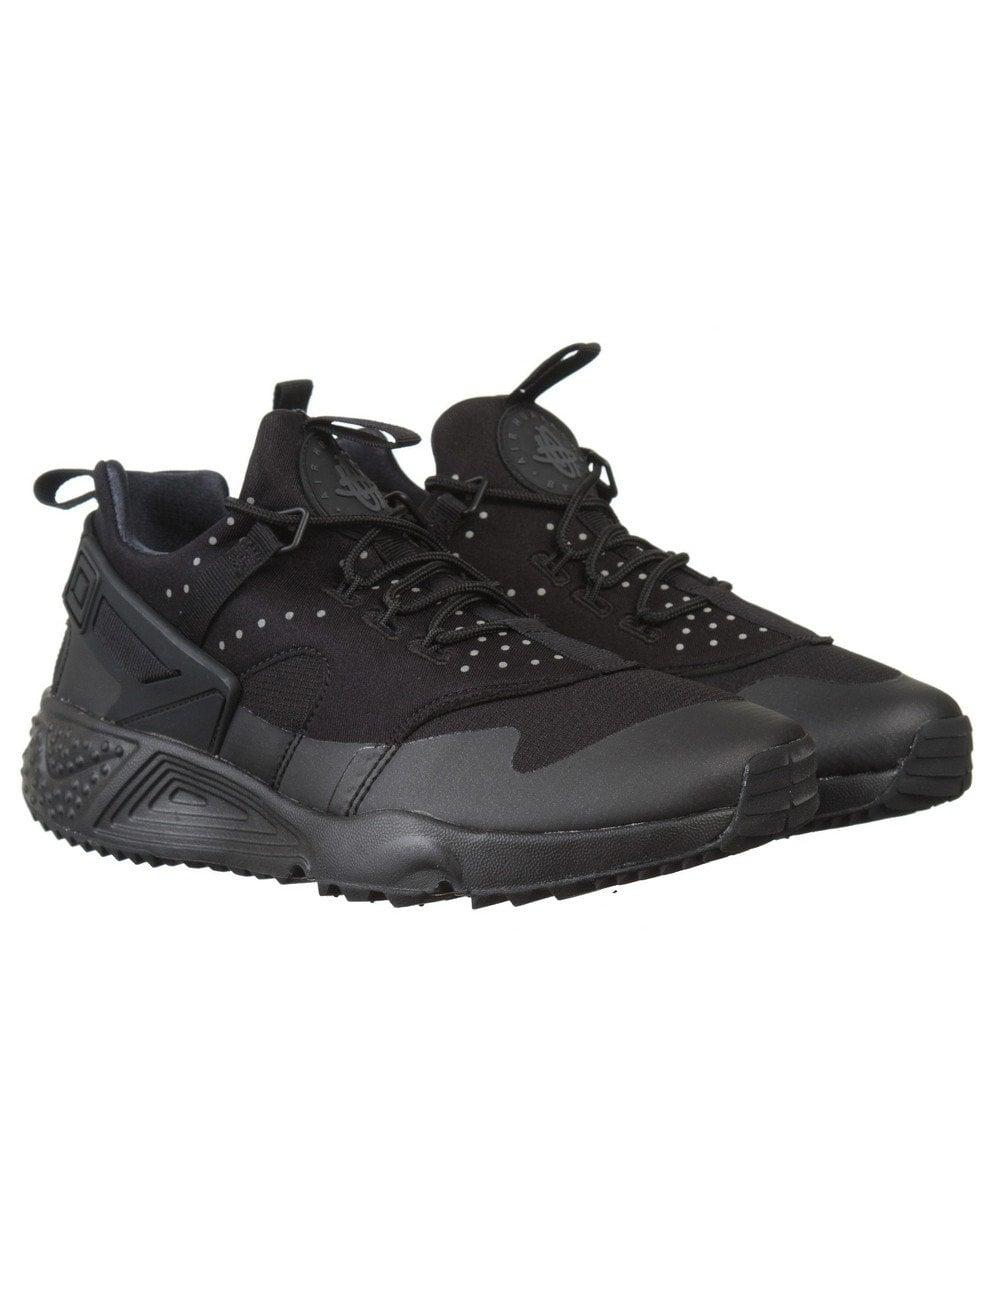 online store d0483 edaf4 Nike Air Huarache Utility Shoes - Black Black